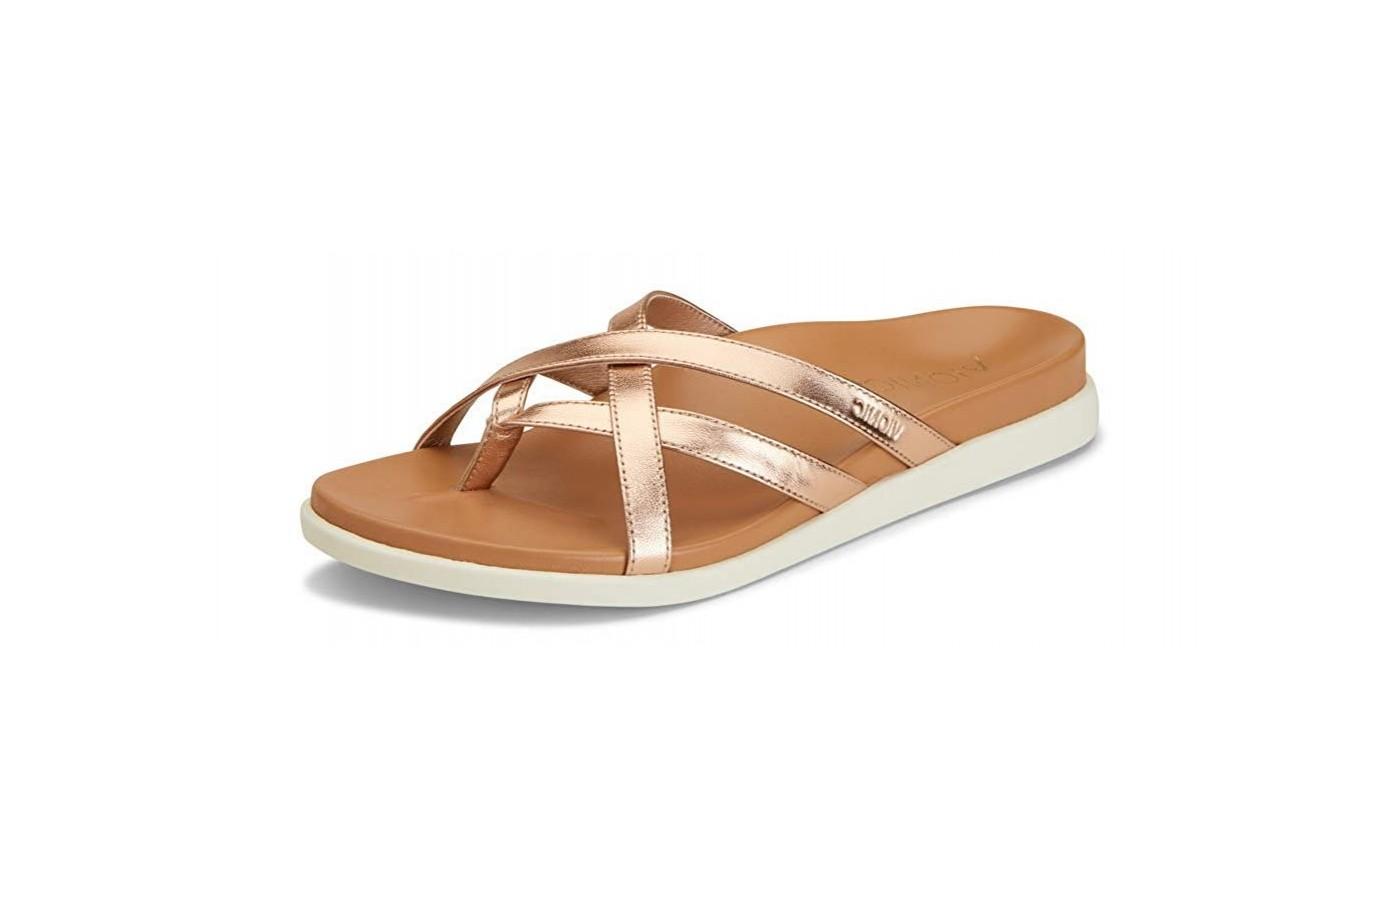 Vionic Palm Daisy sandal